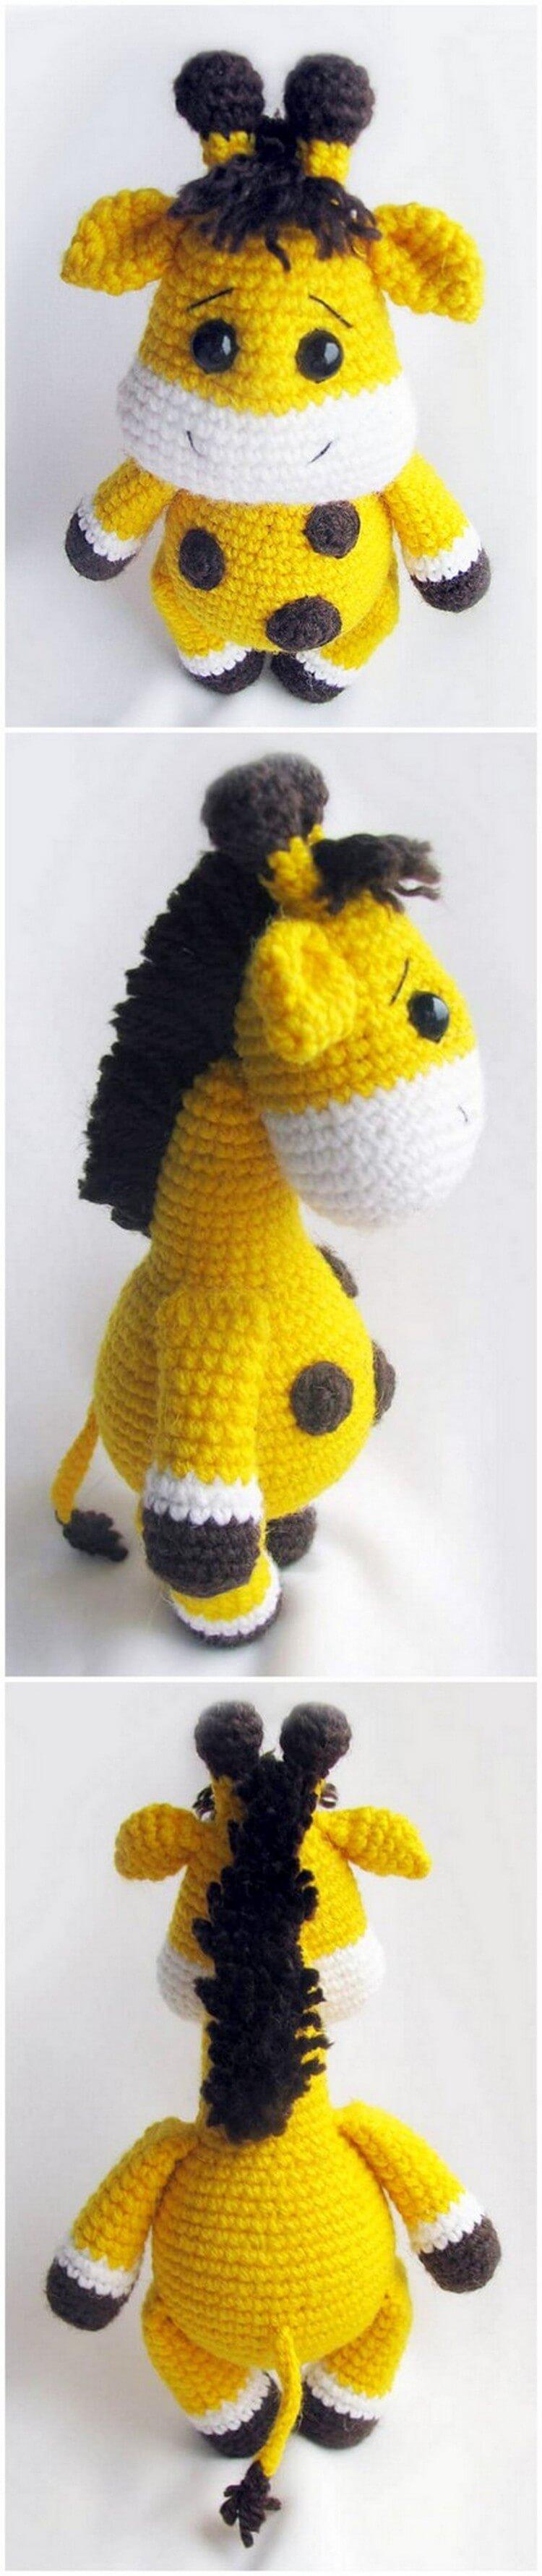 Crochet Amigurumi Pattern (67)